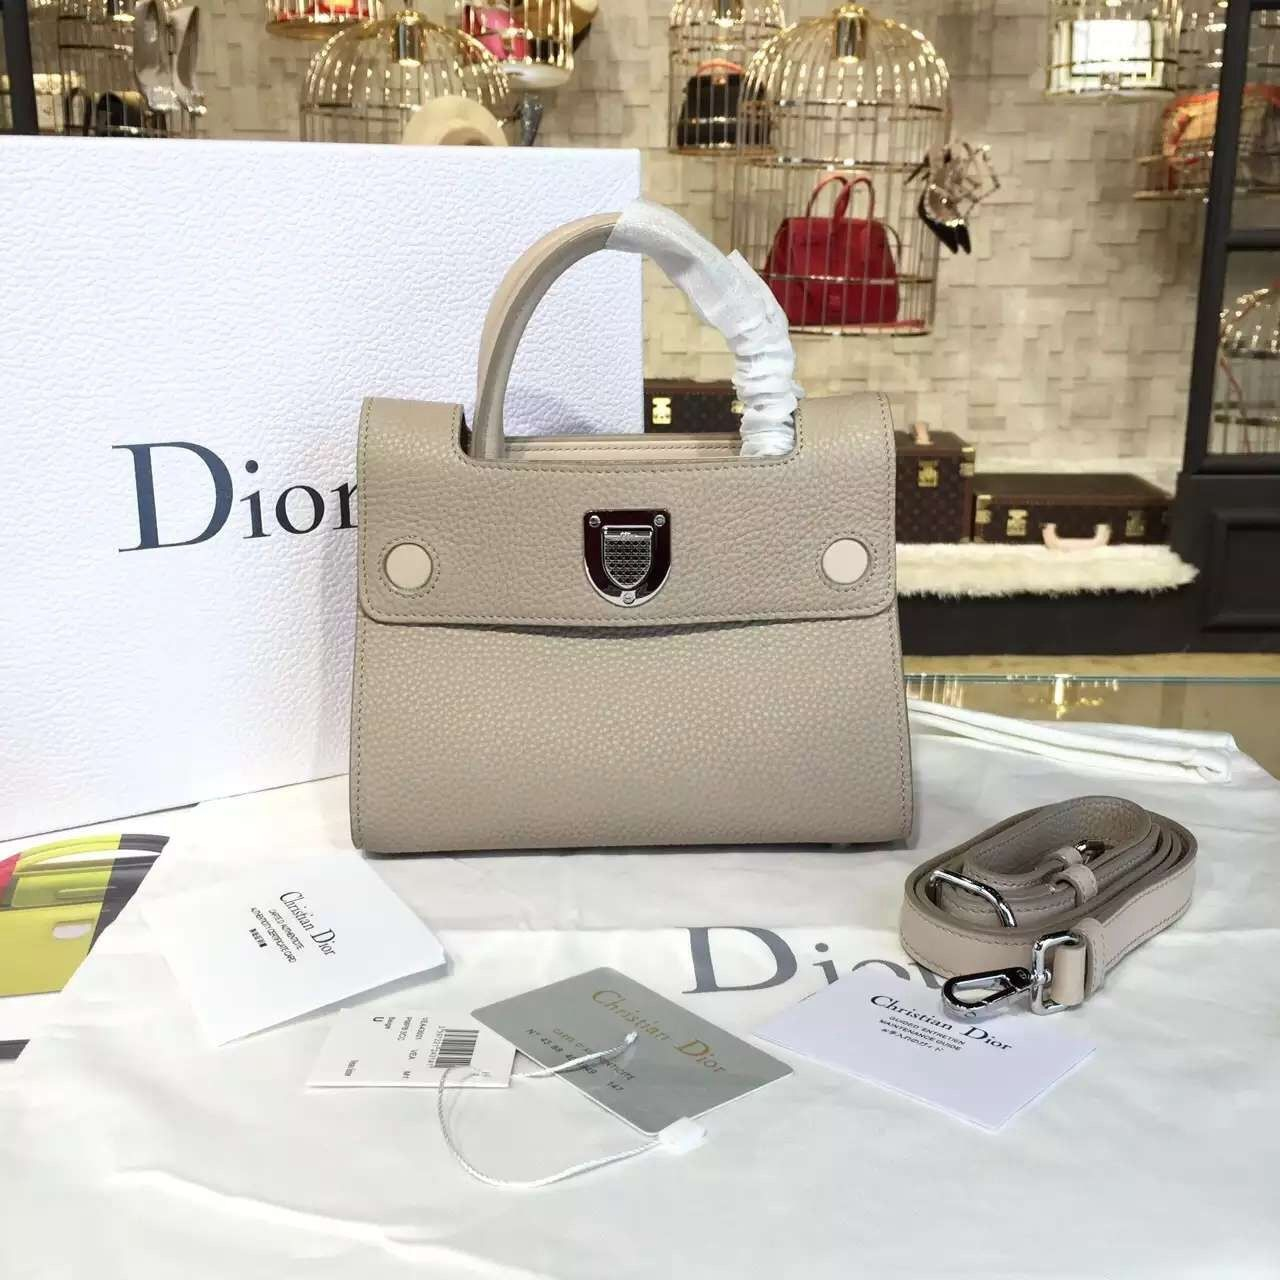 6fc8d3a993 Dior Diorever Tote Mini Bag Calfskin Leather Bag Fall/Winter 2016  Collection, Beige